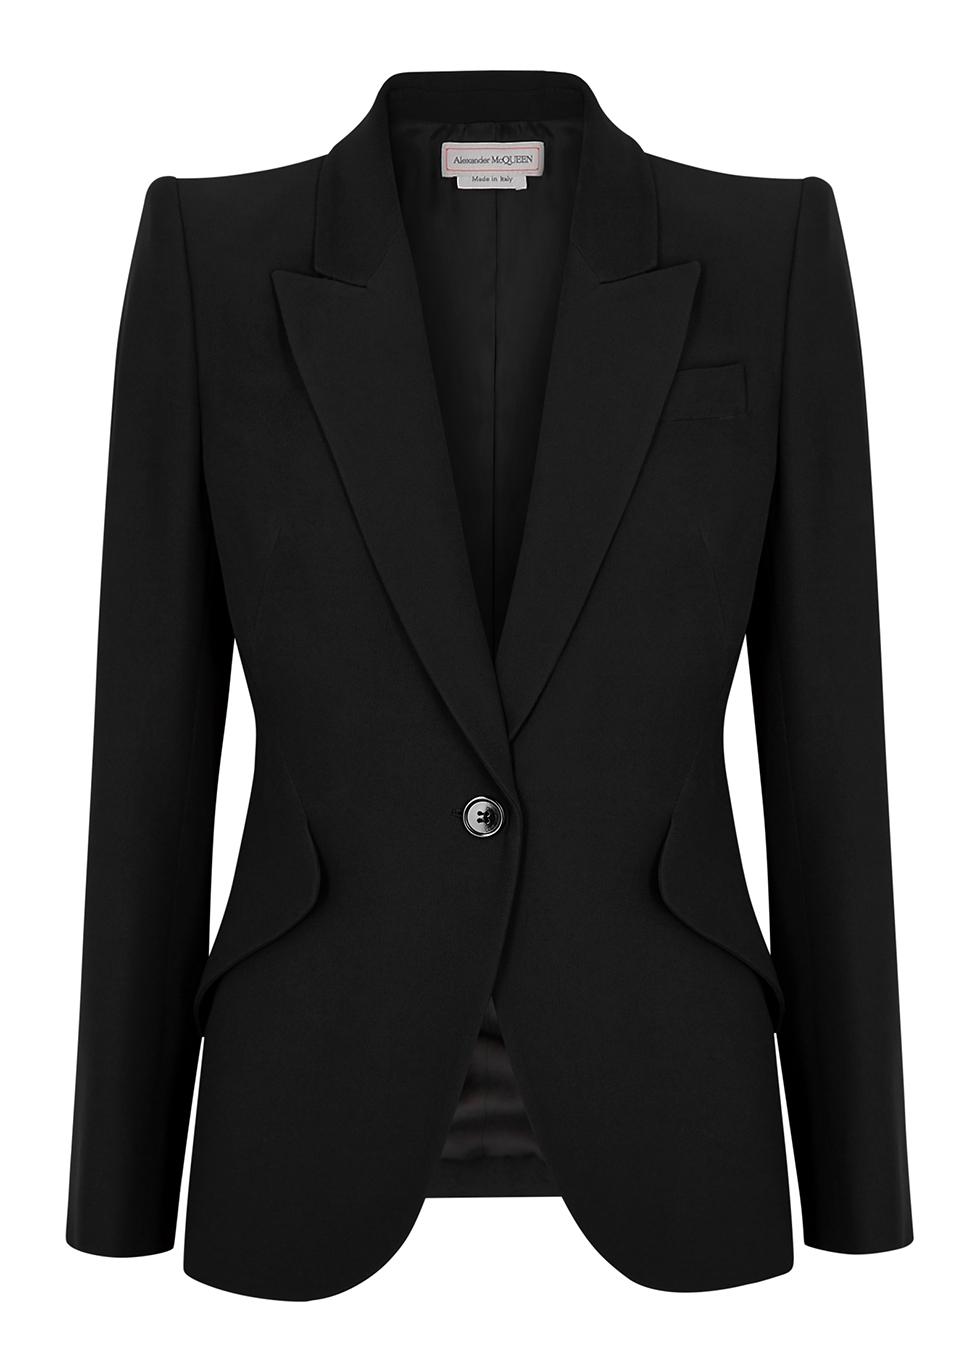 Black tailored woven blazer